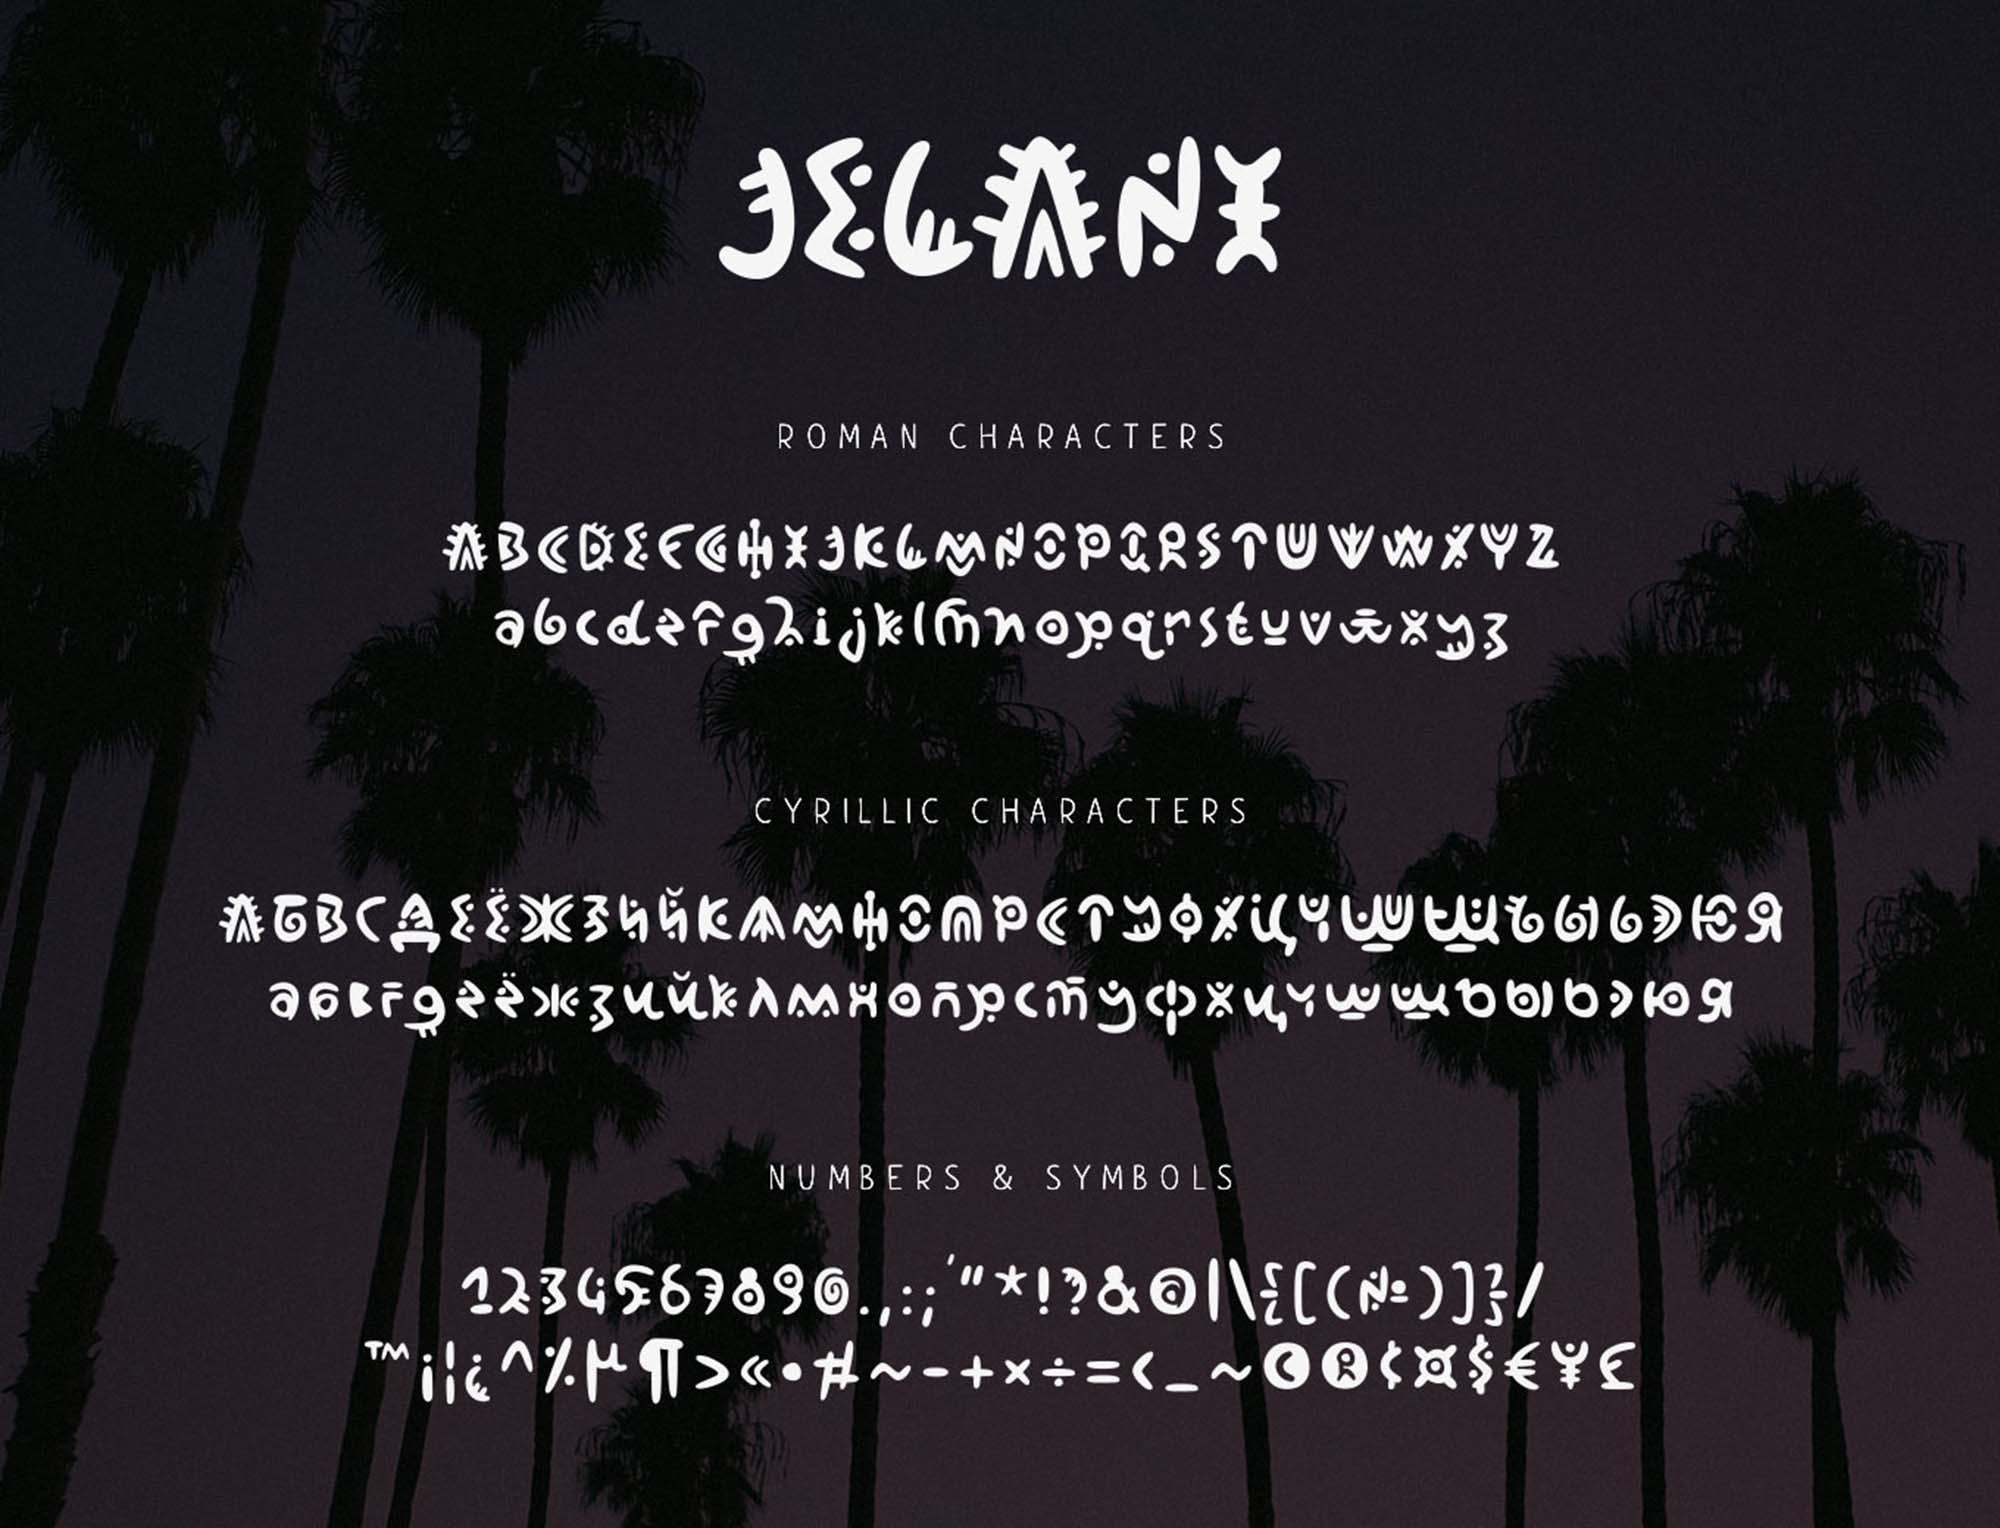 Jelani Display Font Characters